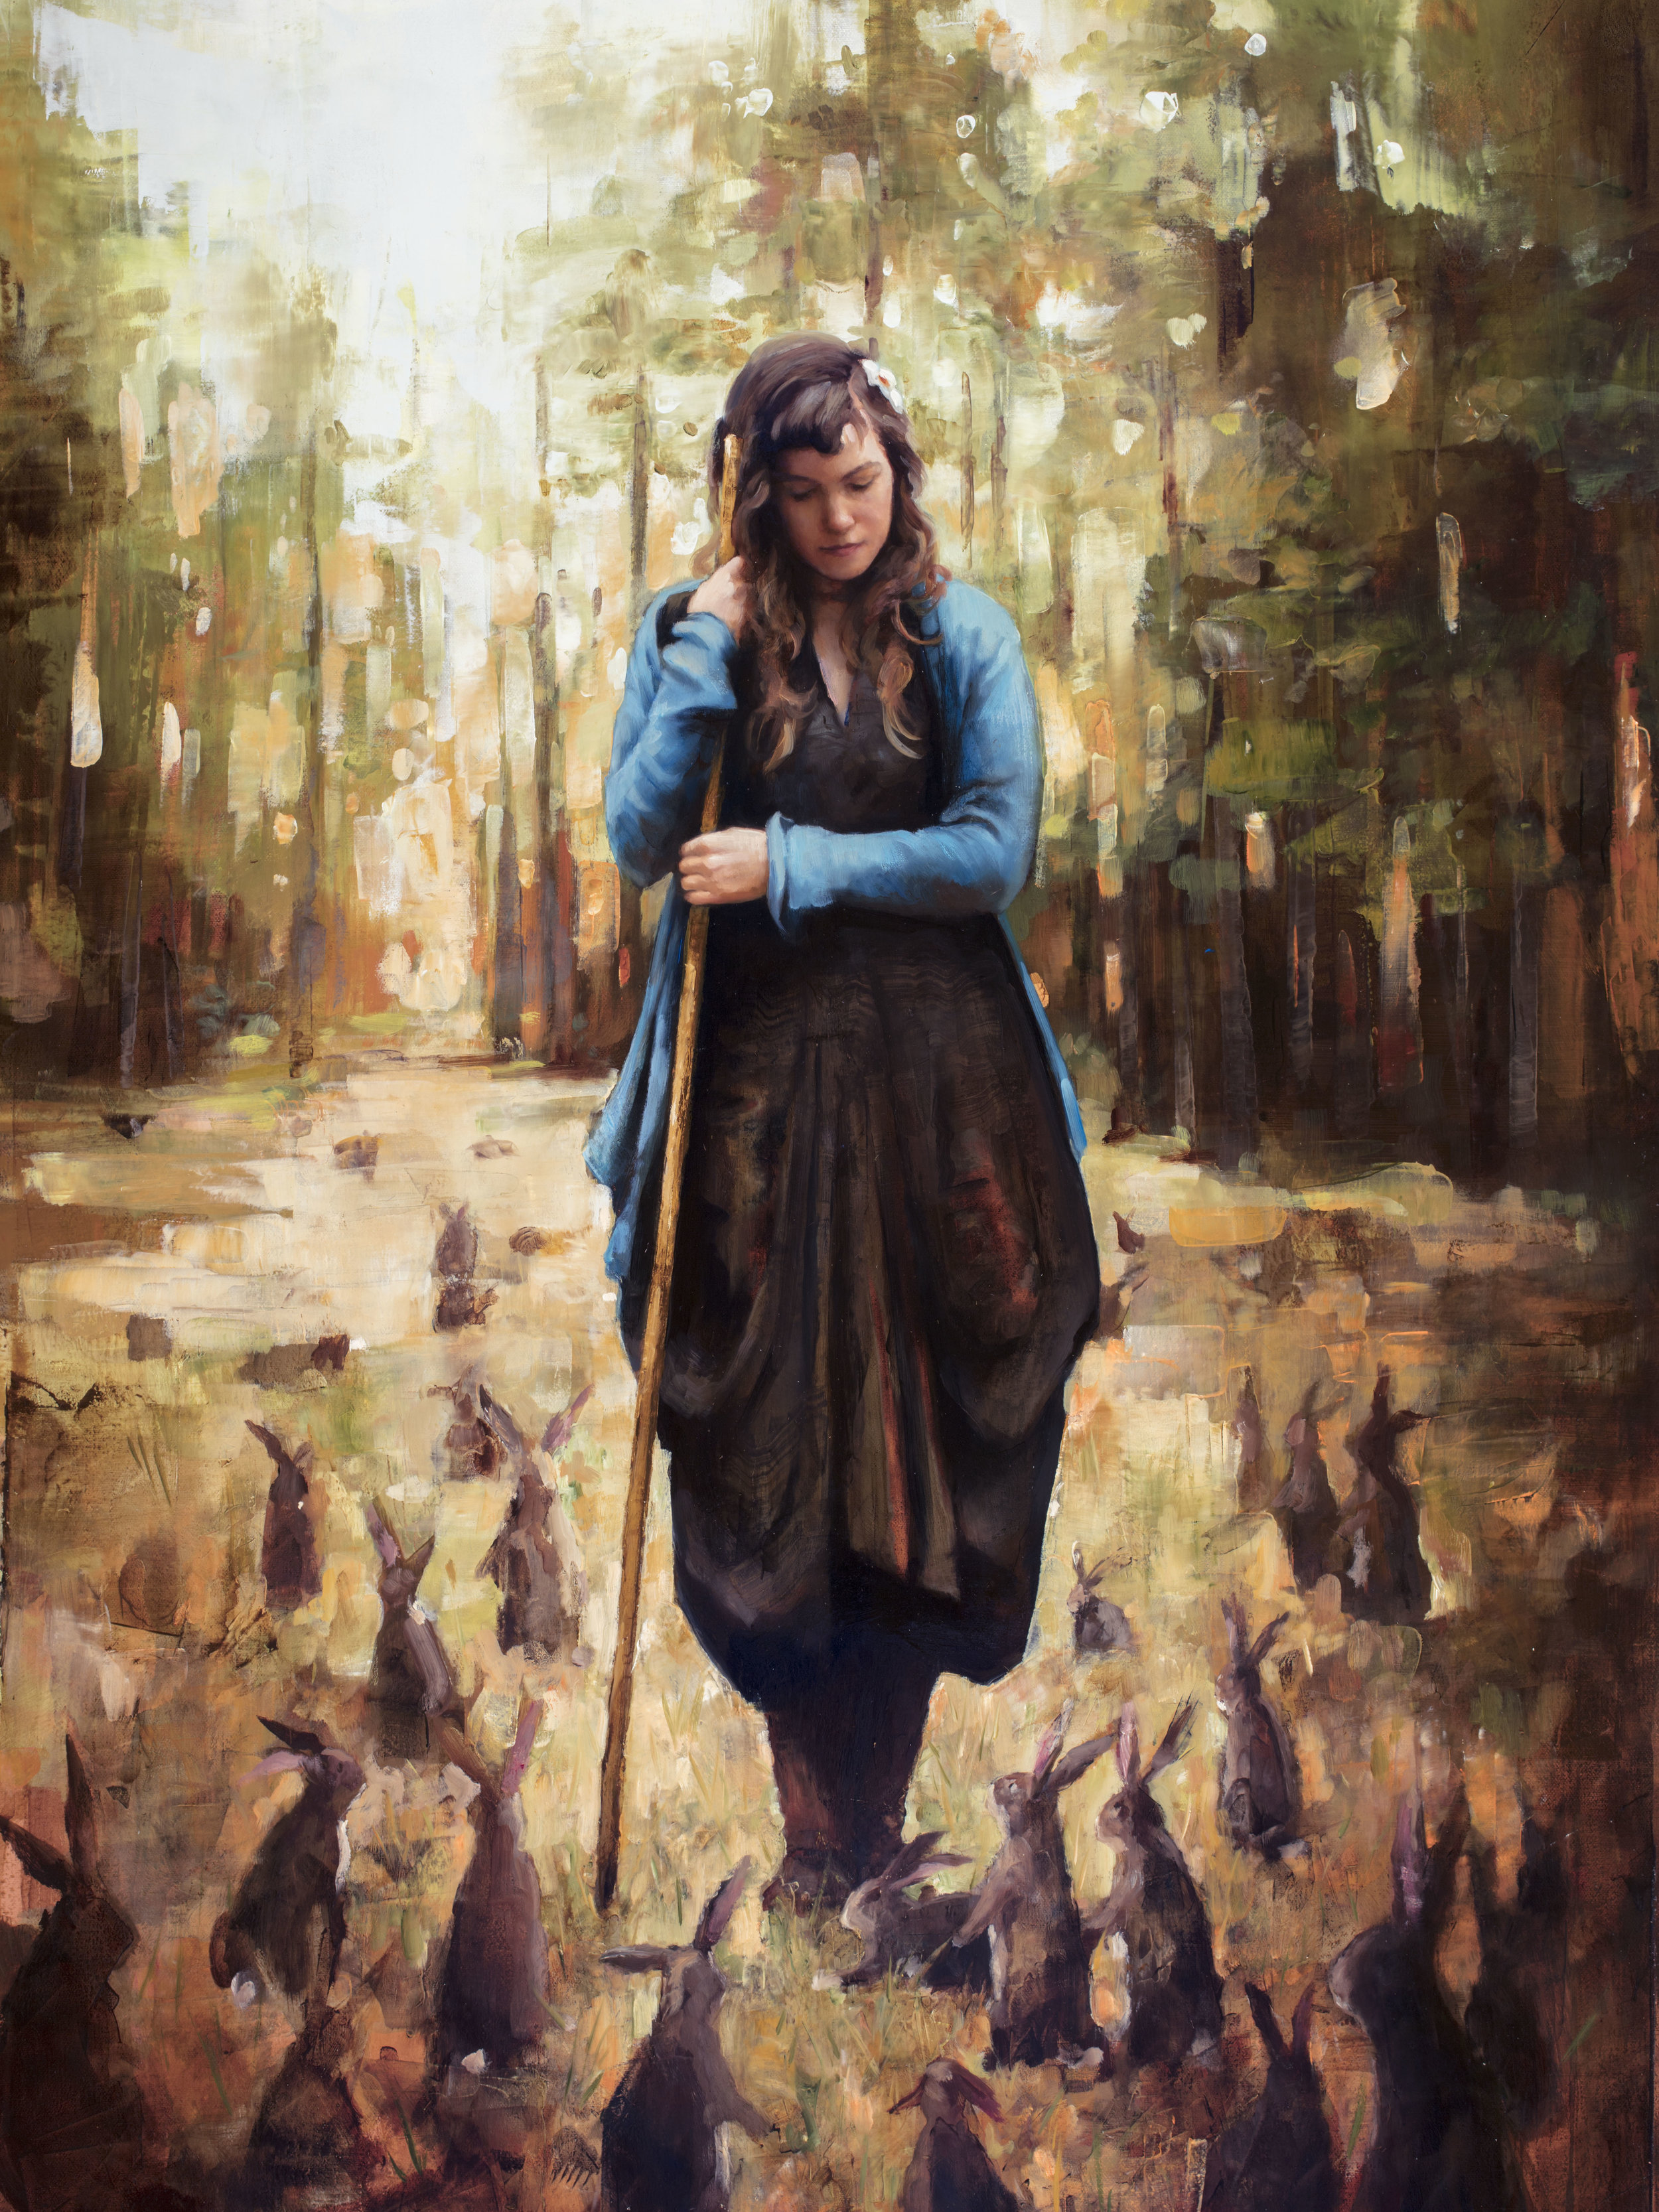 The Return, Oil on Canvas, 2017